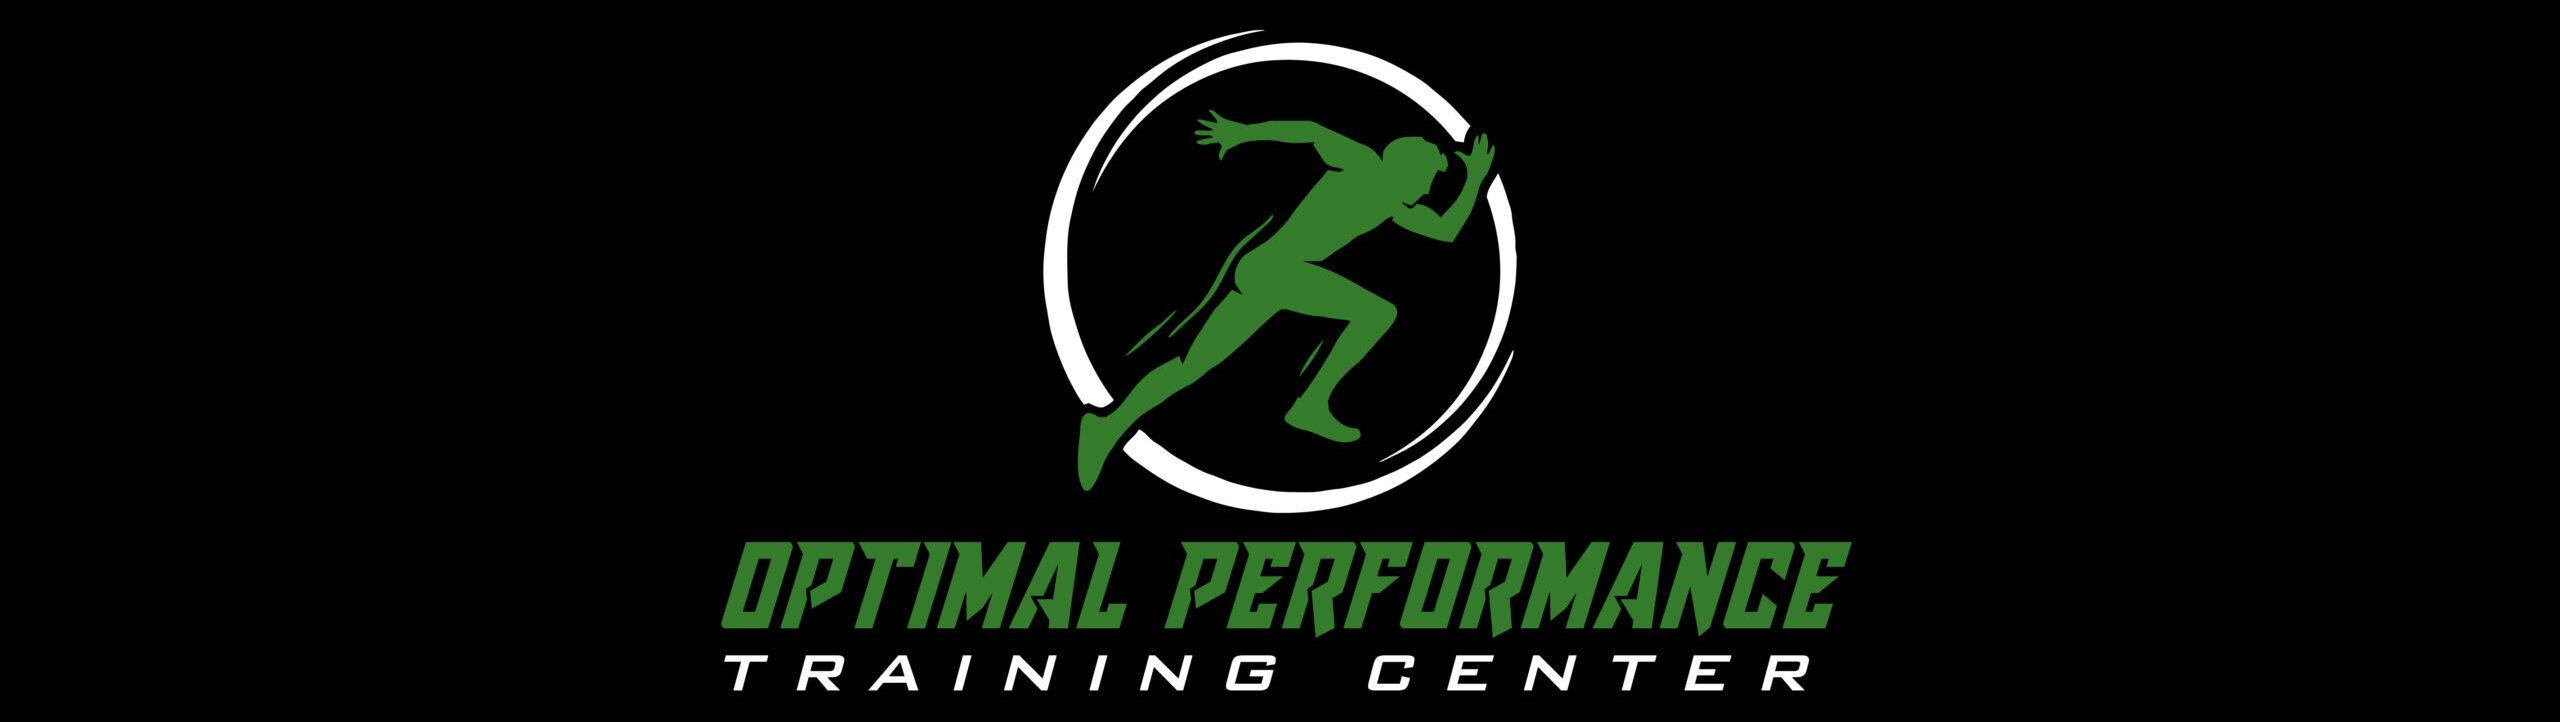 Optimal Performance Training Center